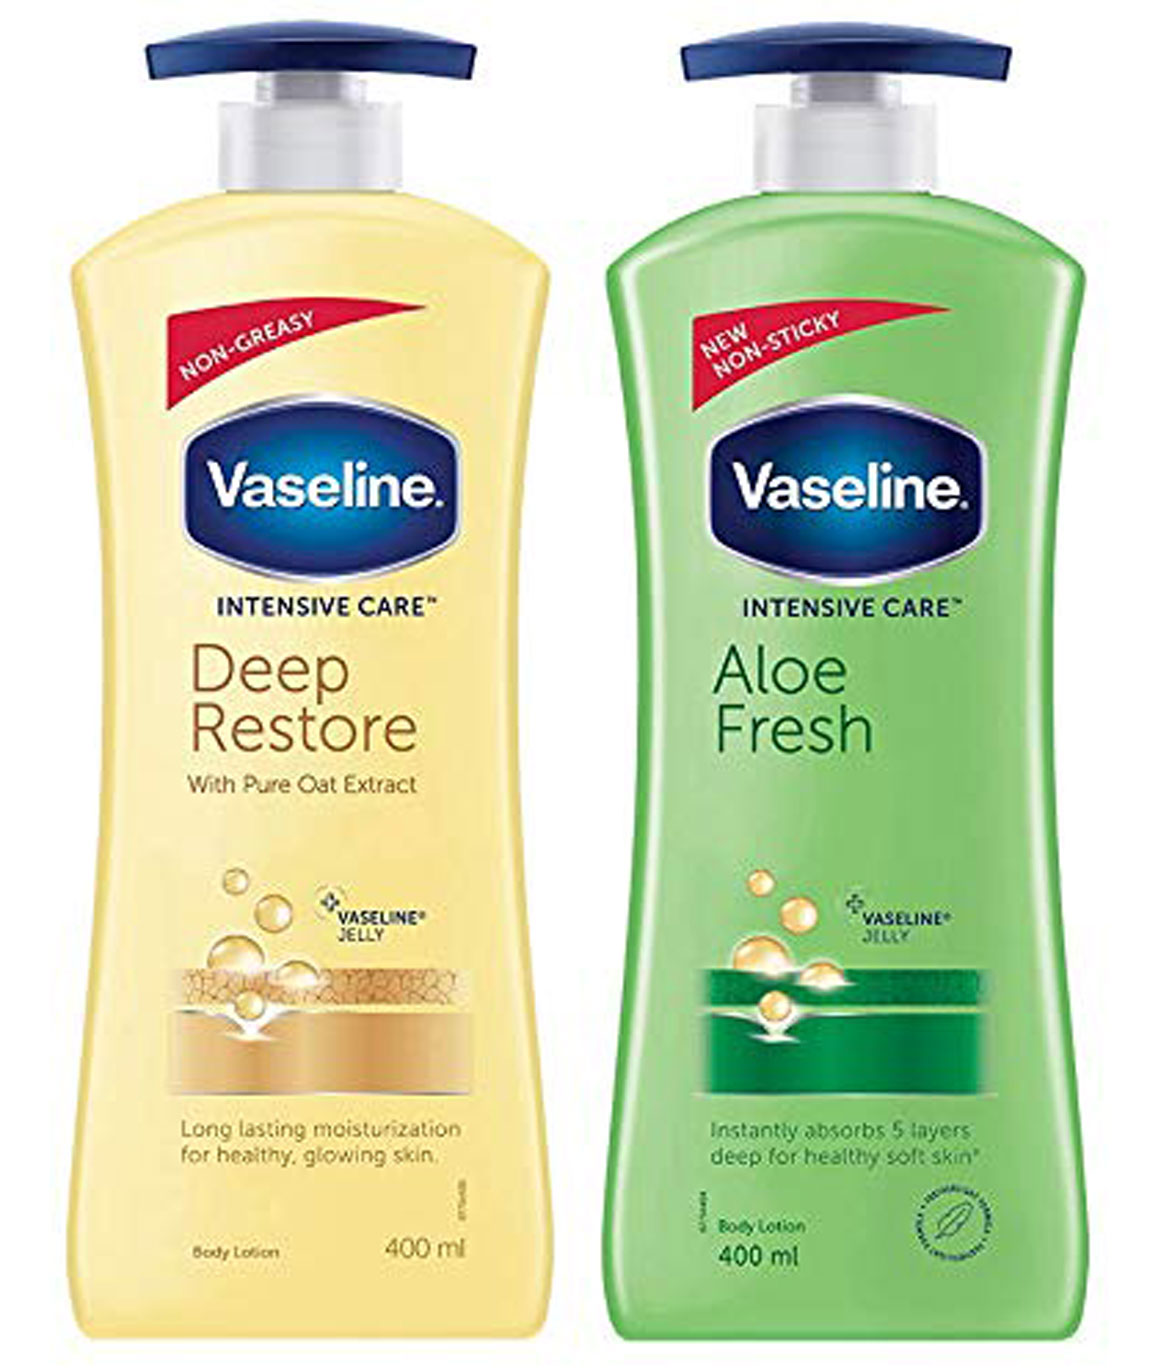 Vaseline Intensive Care Deep Restore Body Lotion, 400 ml & Vaseline Intensive Care Aloe Fresh Body Lotion, 400 ml